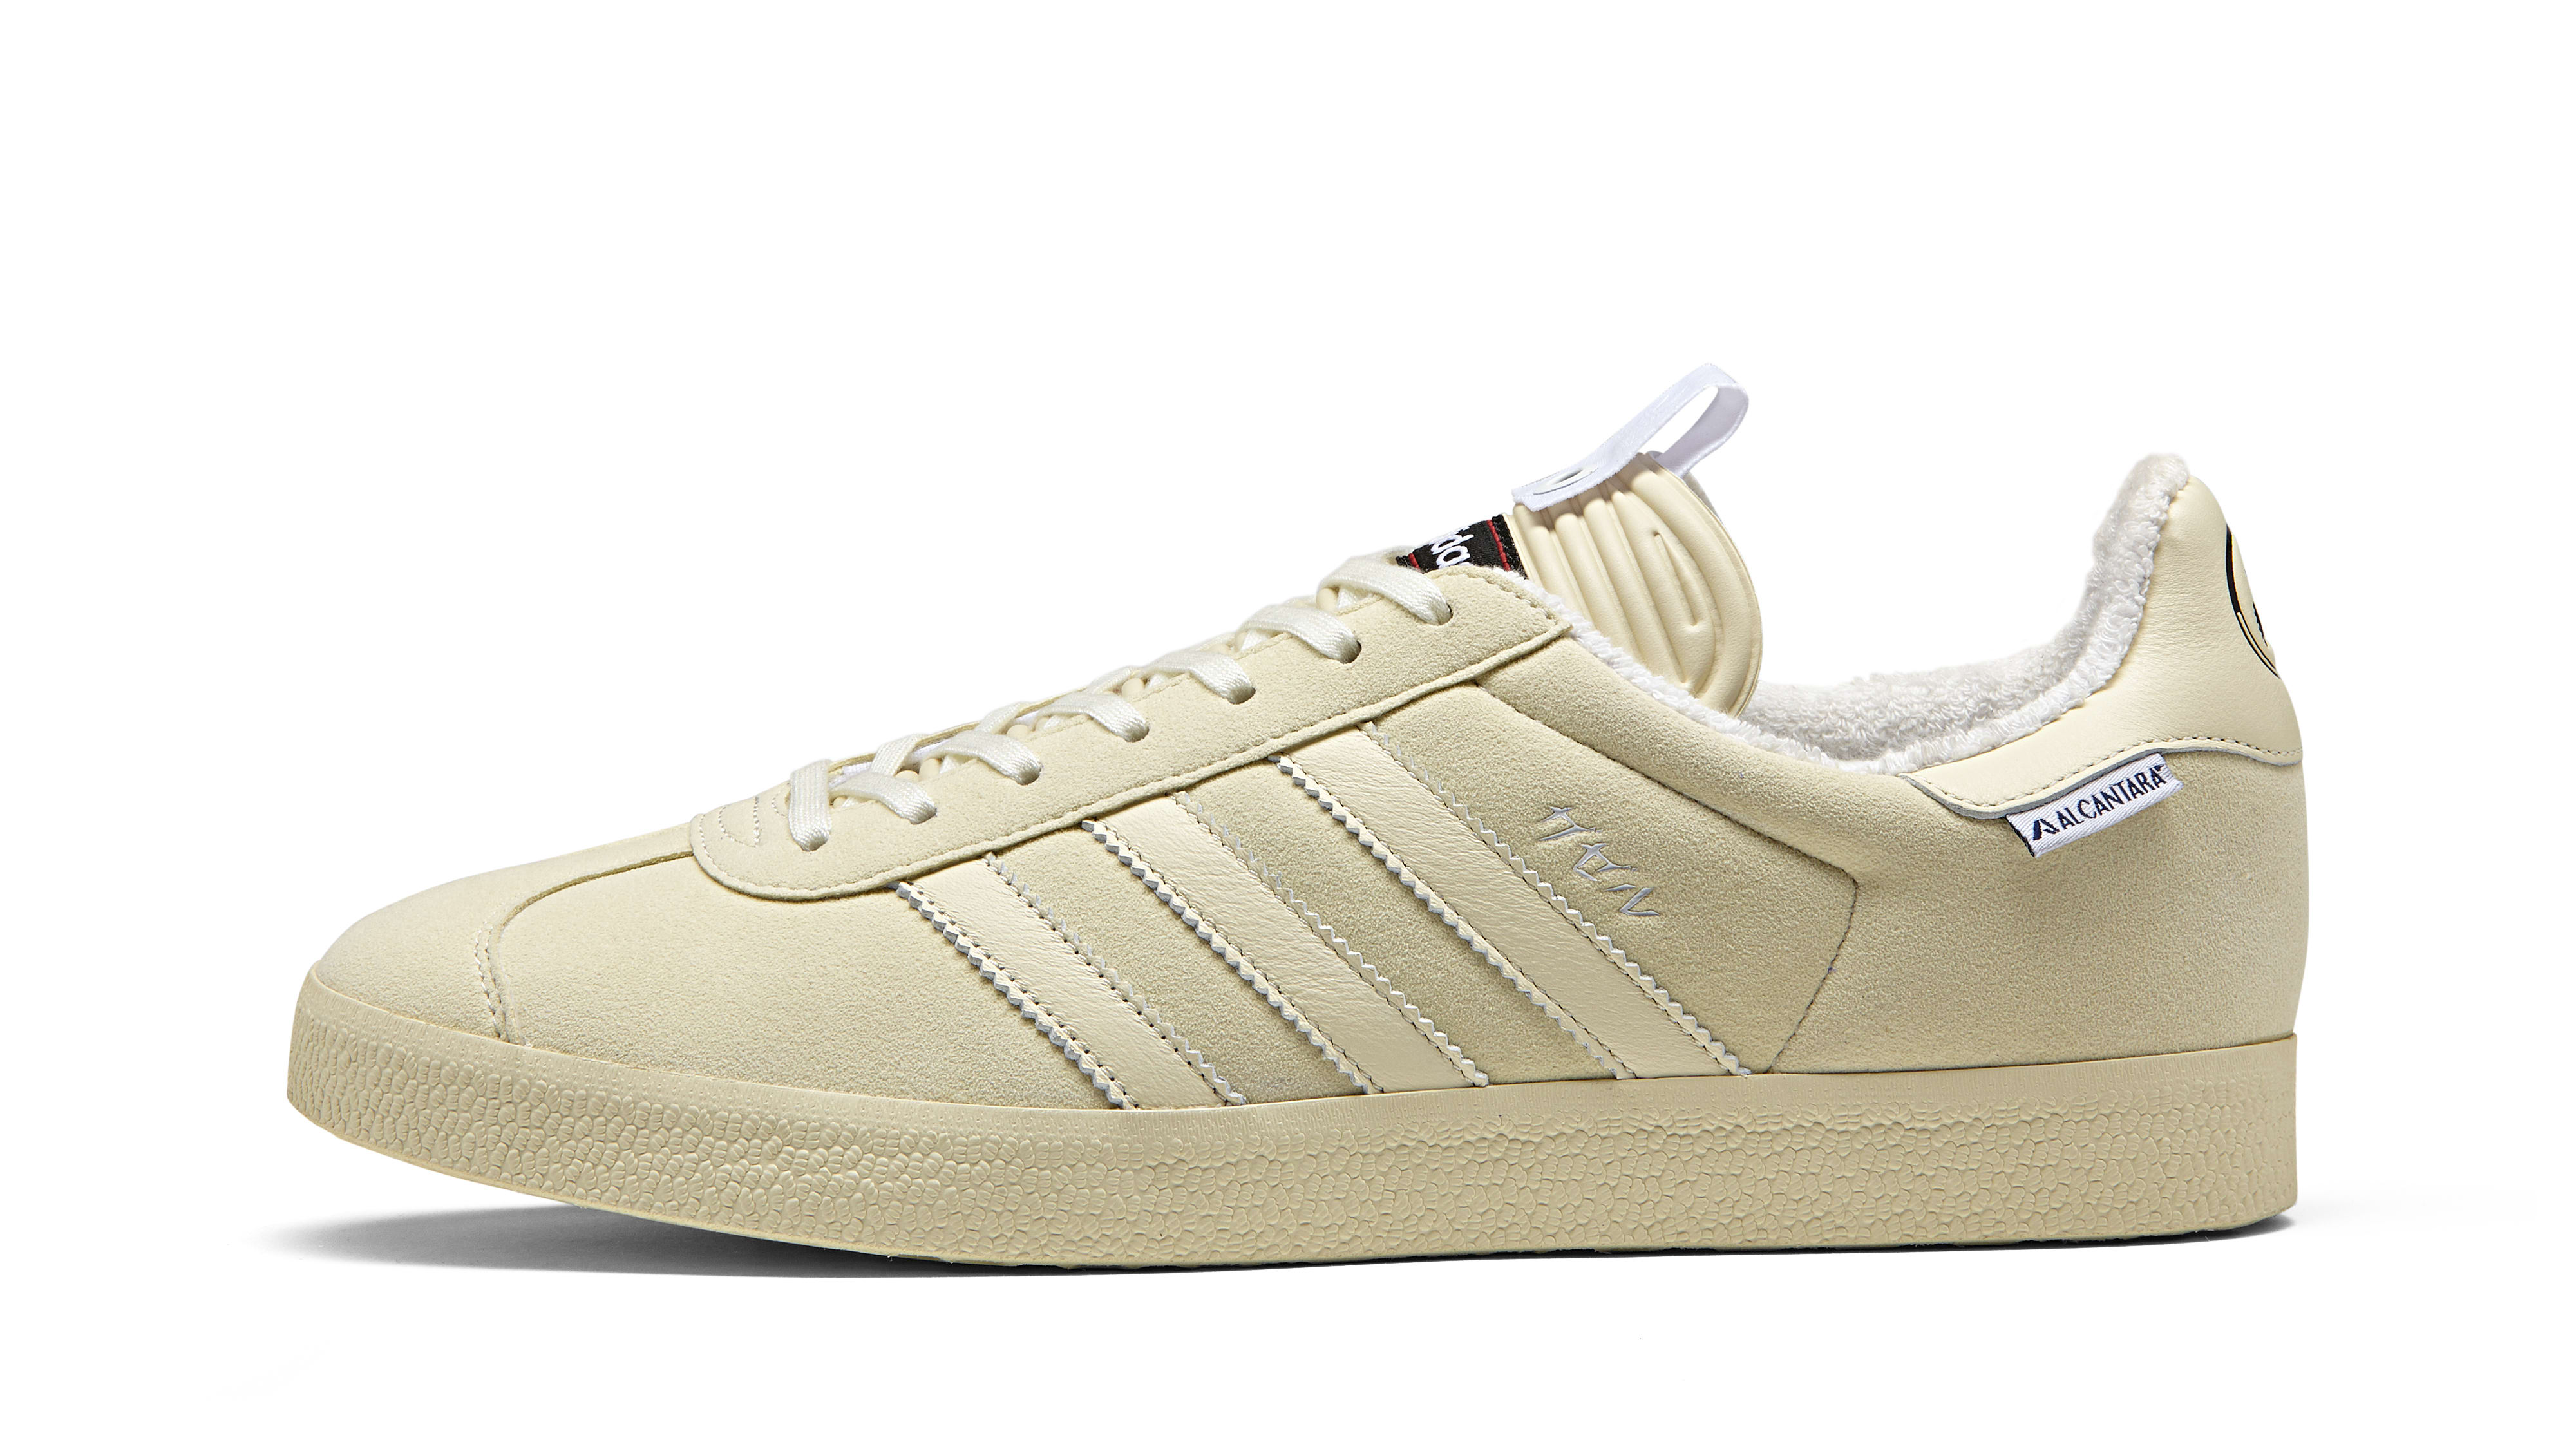 Adidas SlamJam x United Arrow and Sons Gazelle